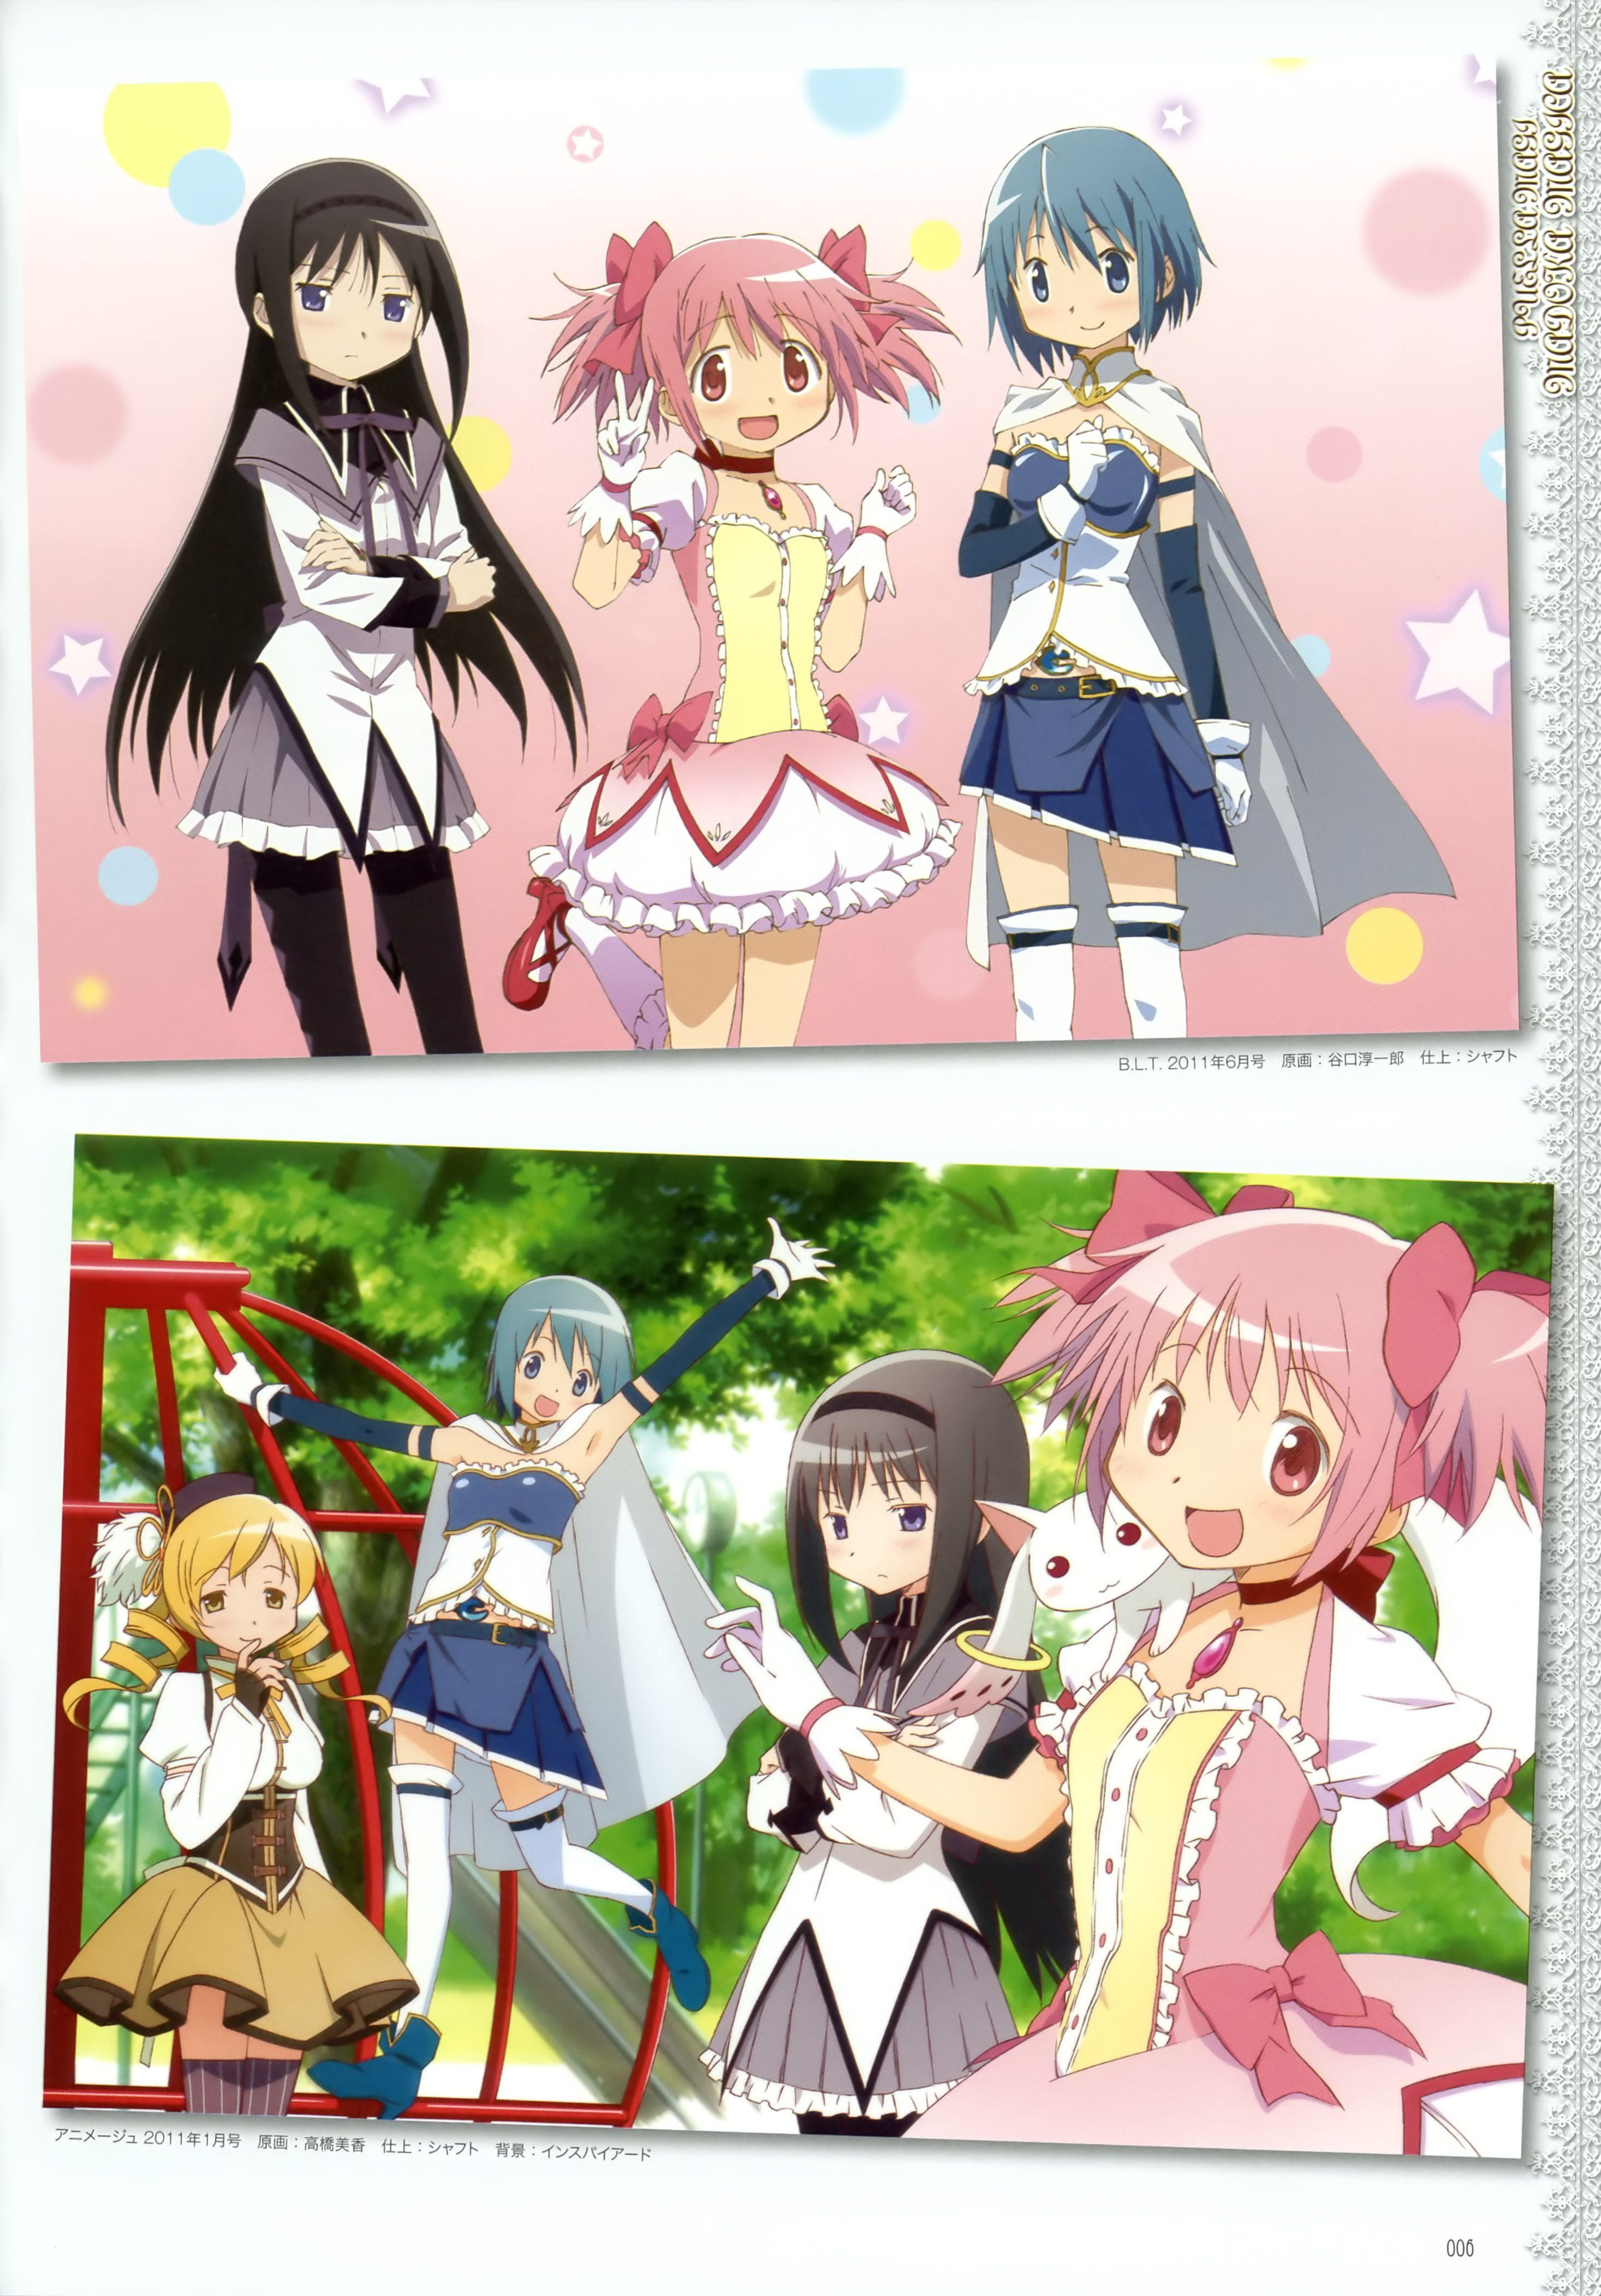 Favorite Anime Log おしゃれまとめの人気アイデア Pinterest とりぃ丸 アニメ 魔法少女 魔法少女まどかマギカ